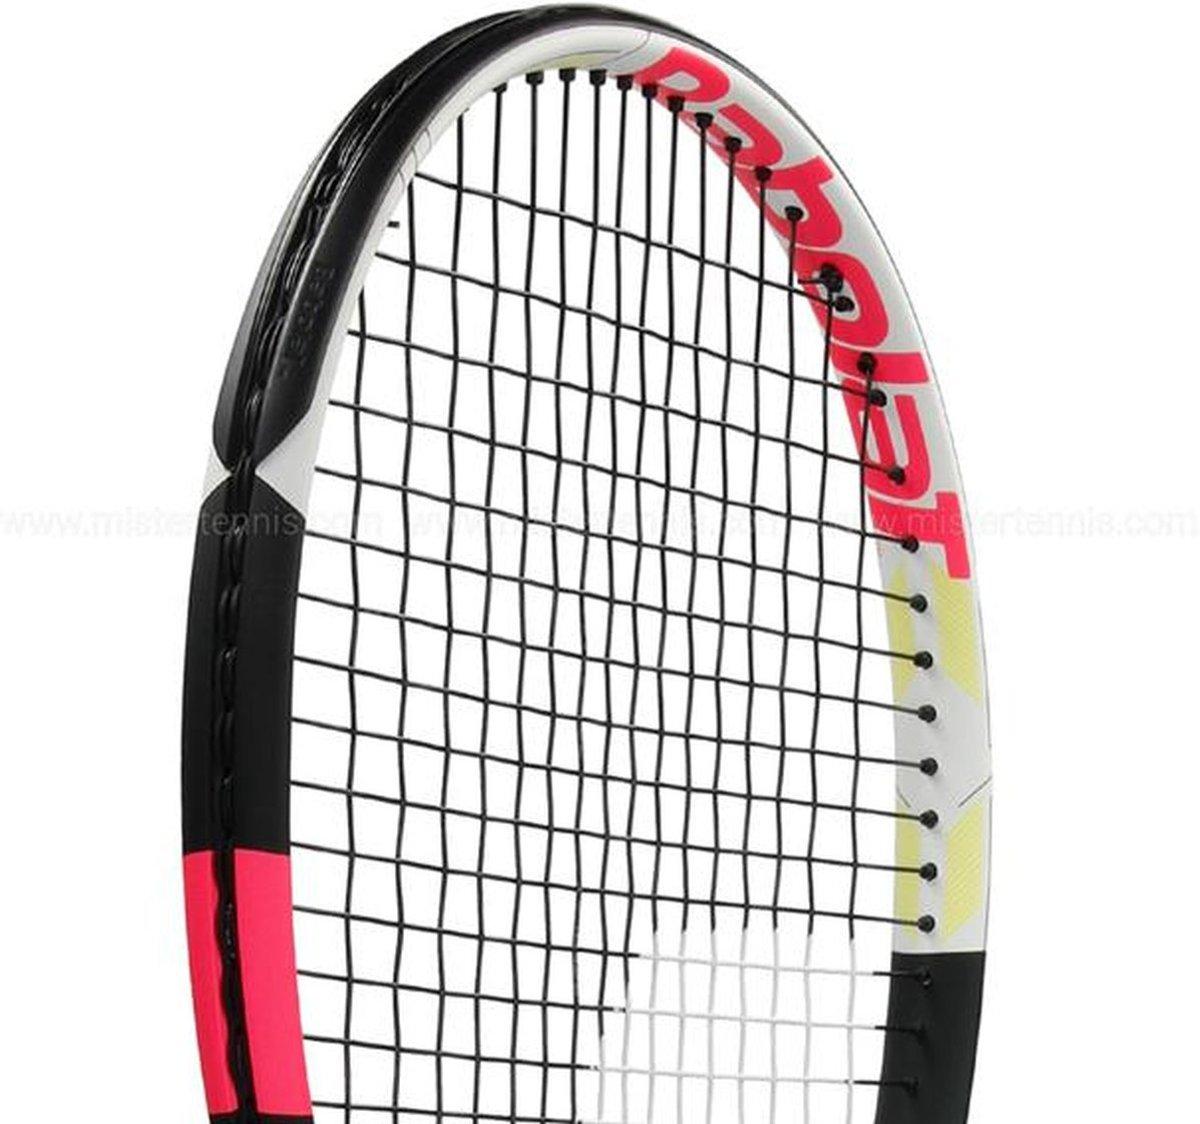 Babolat Boost Aero tennisracket dames zwart/roze/wit